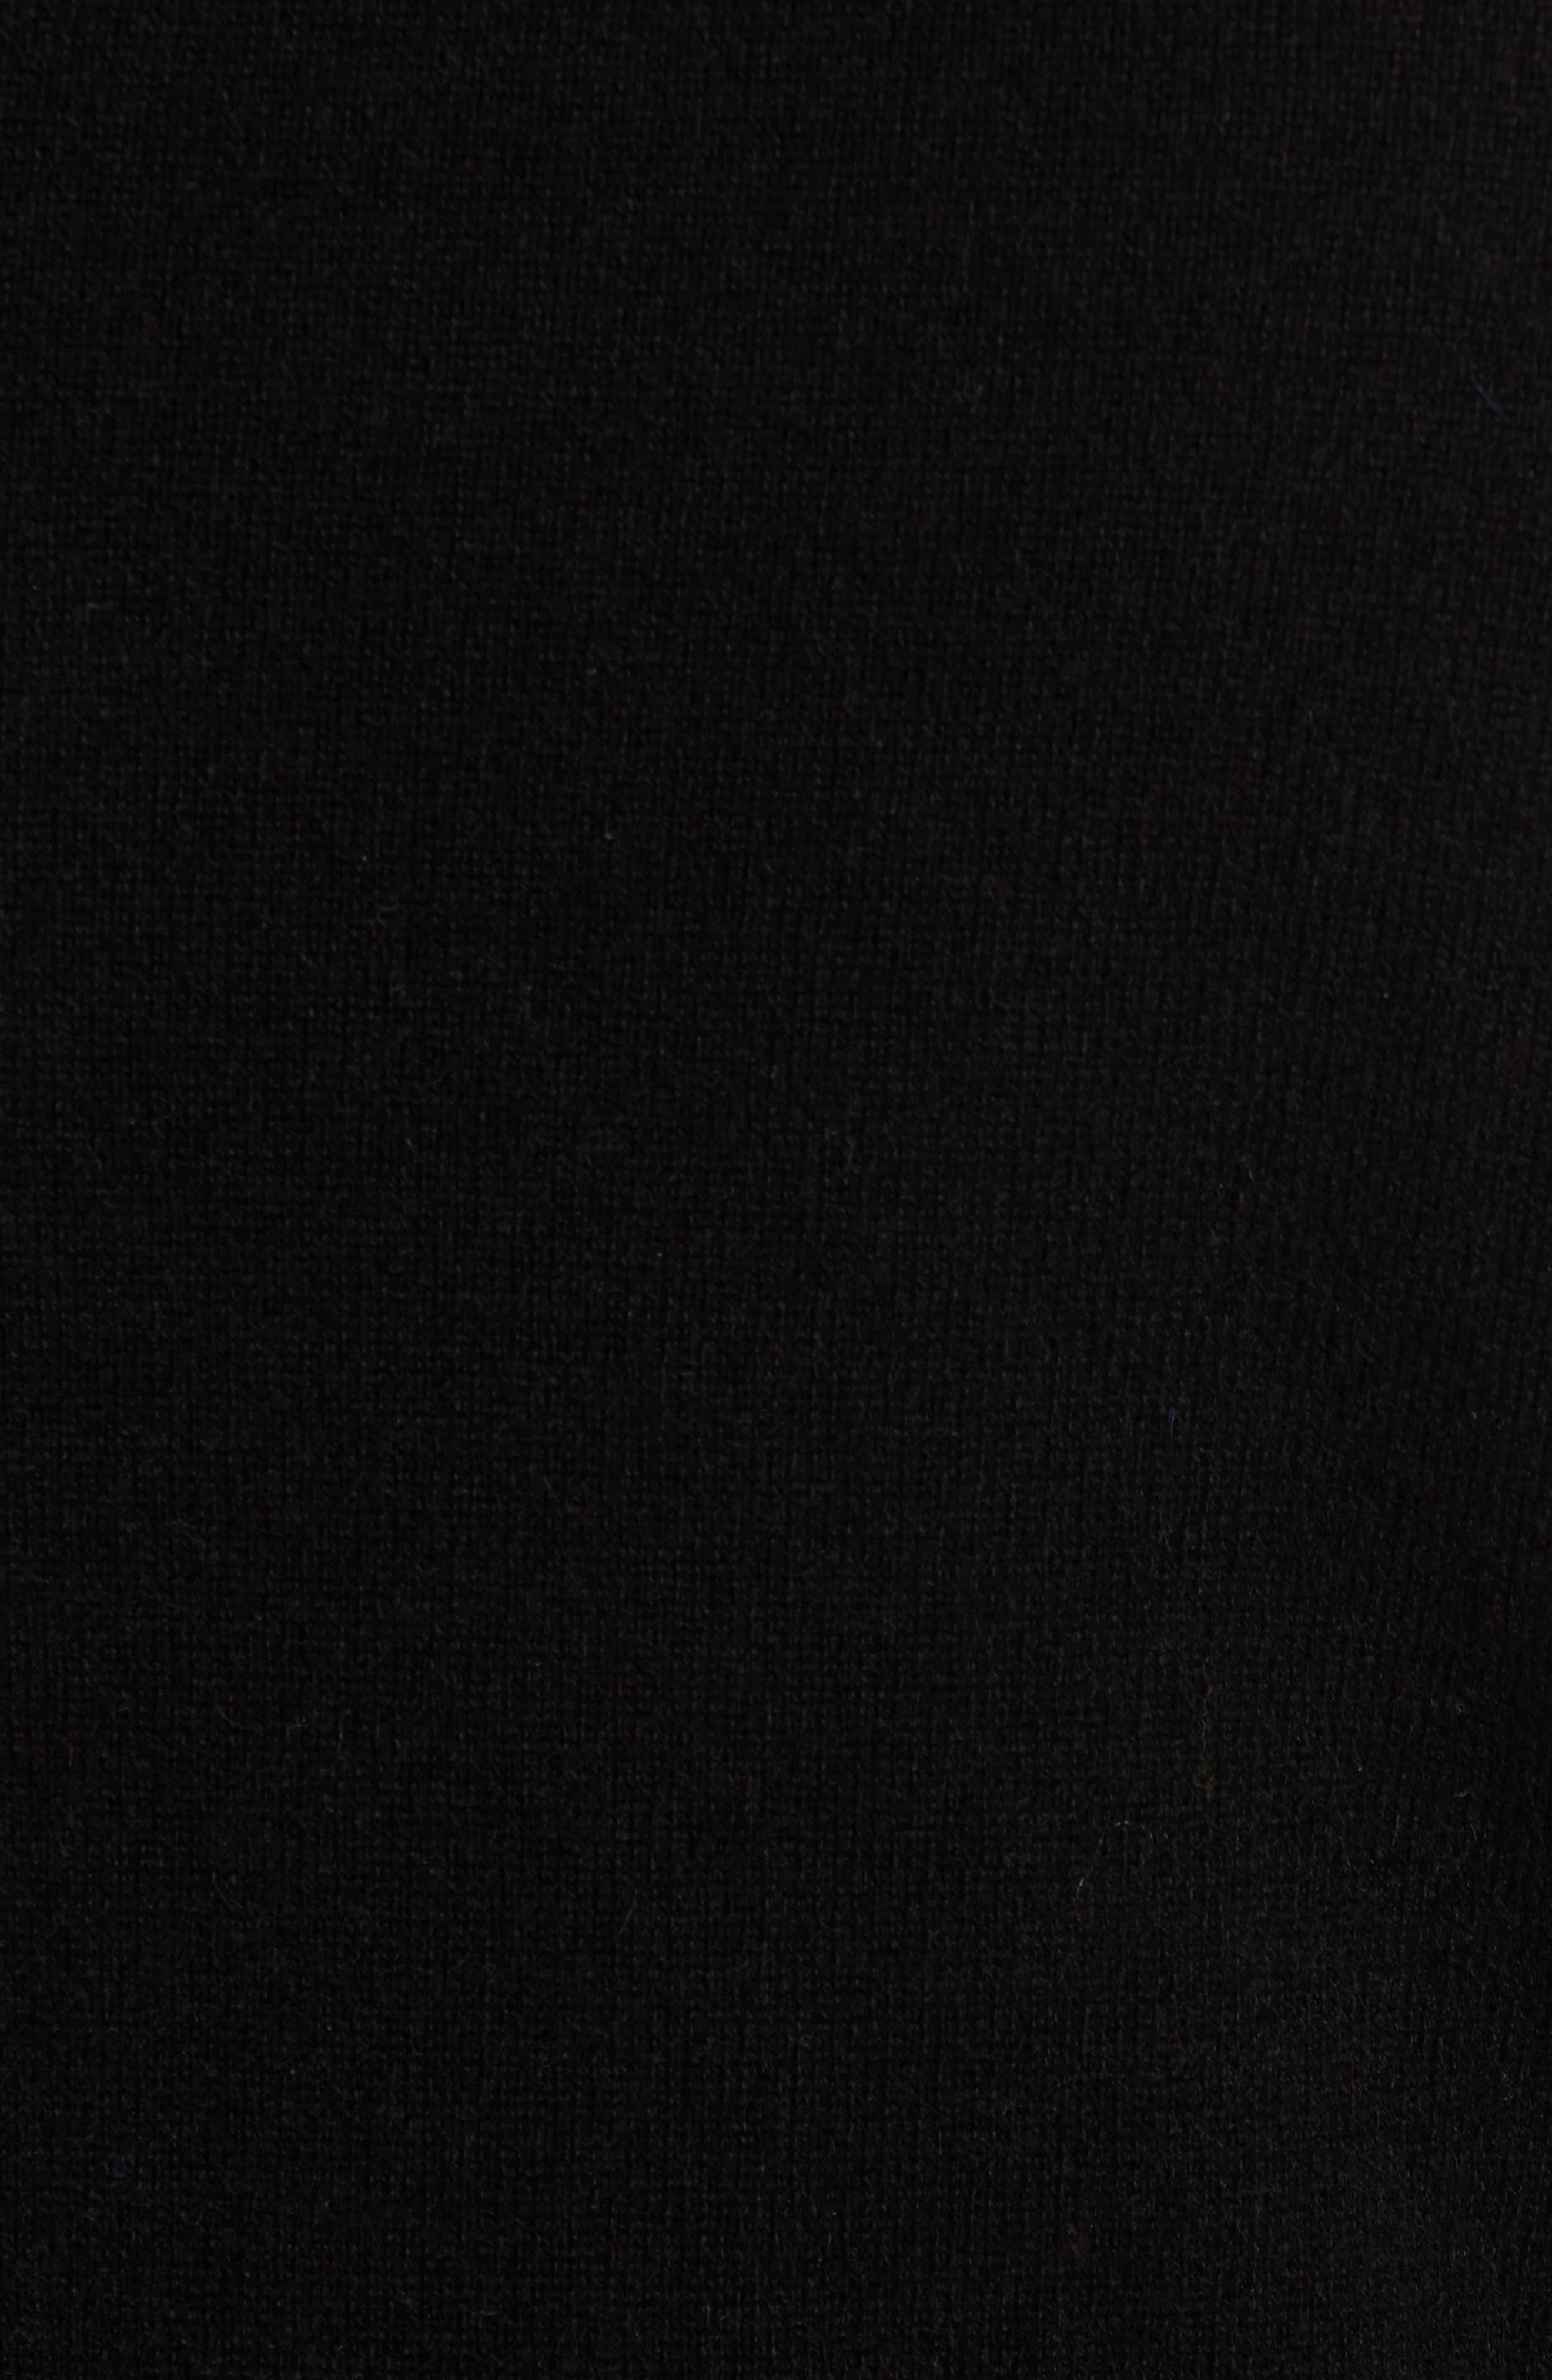 NORDSTROM MEN'S SHOP,                             Cashmere V-Neck Sweater,                             Alternate thumbnail 5, color,                             BLACK CAVIAR